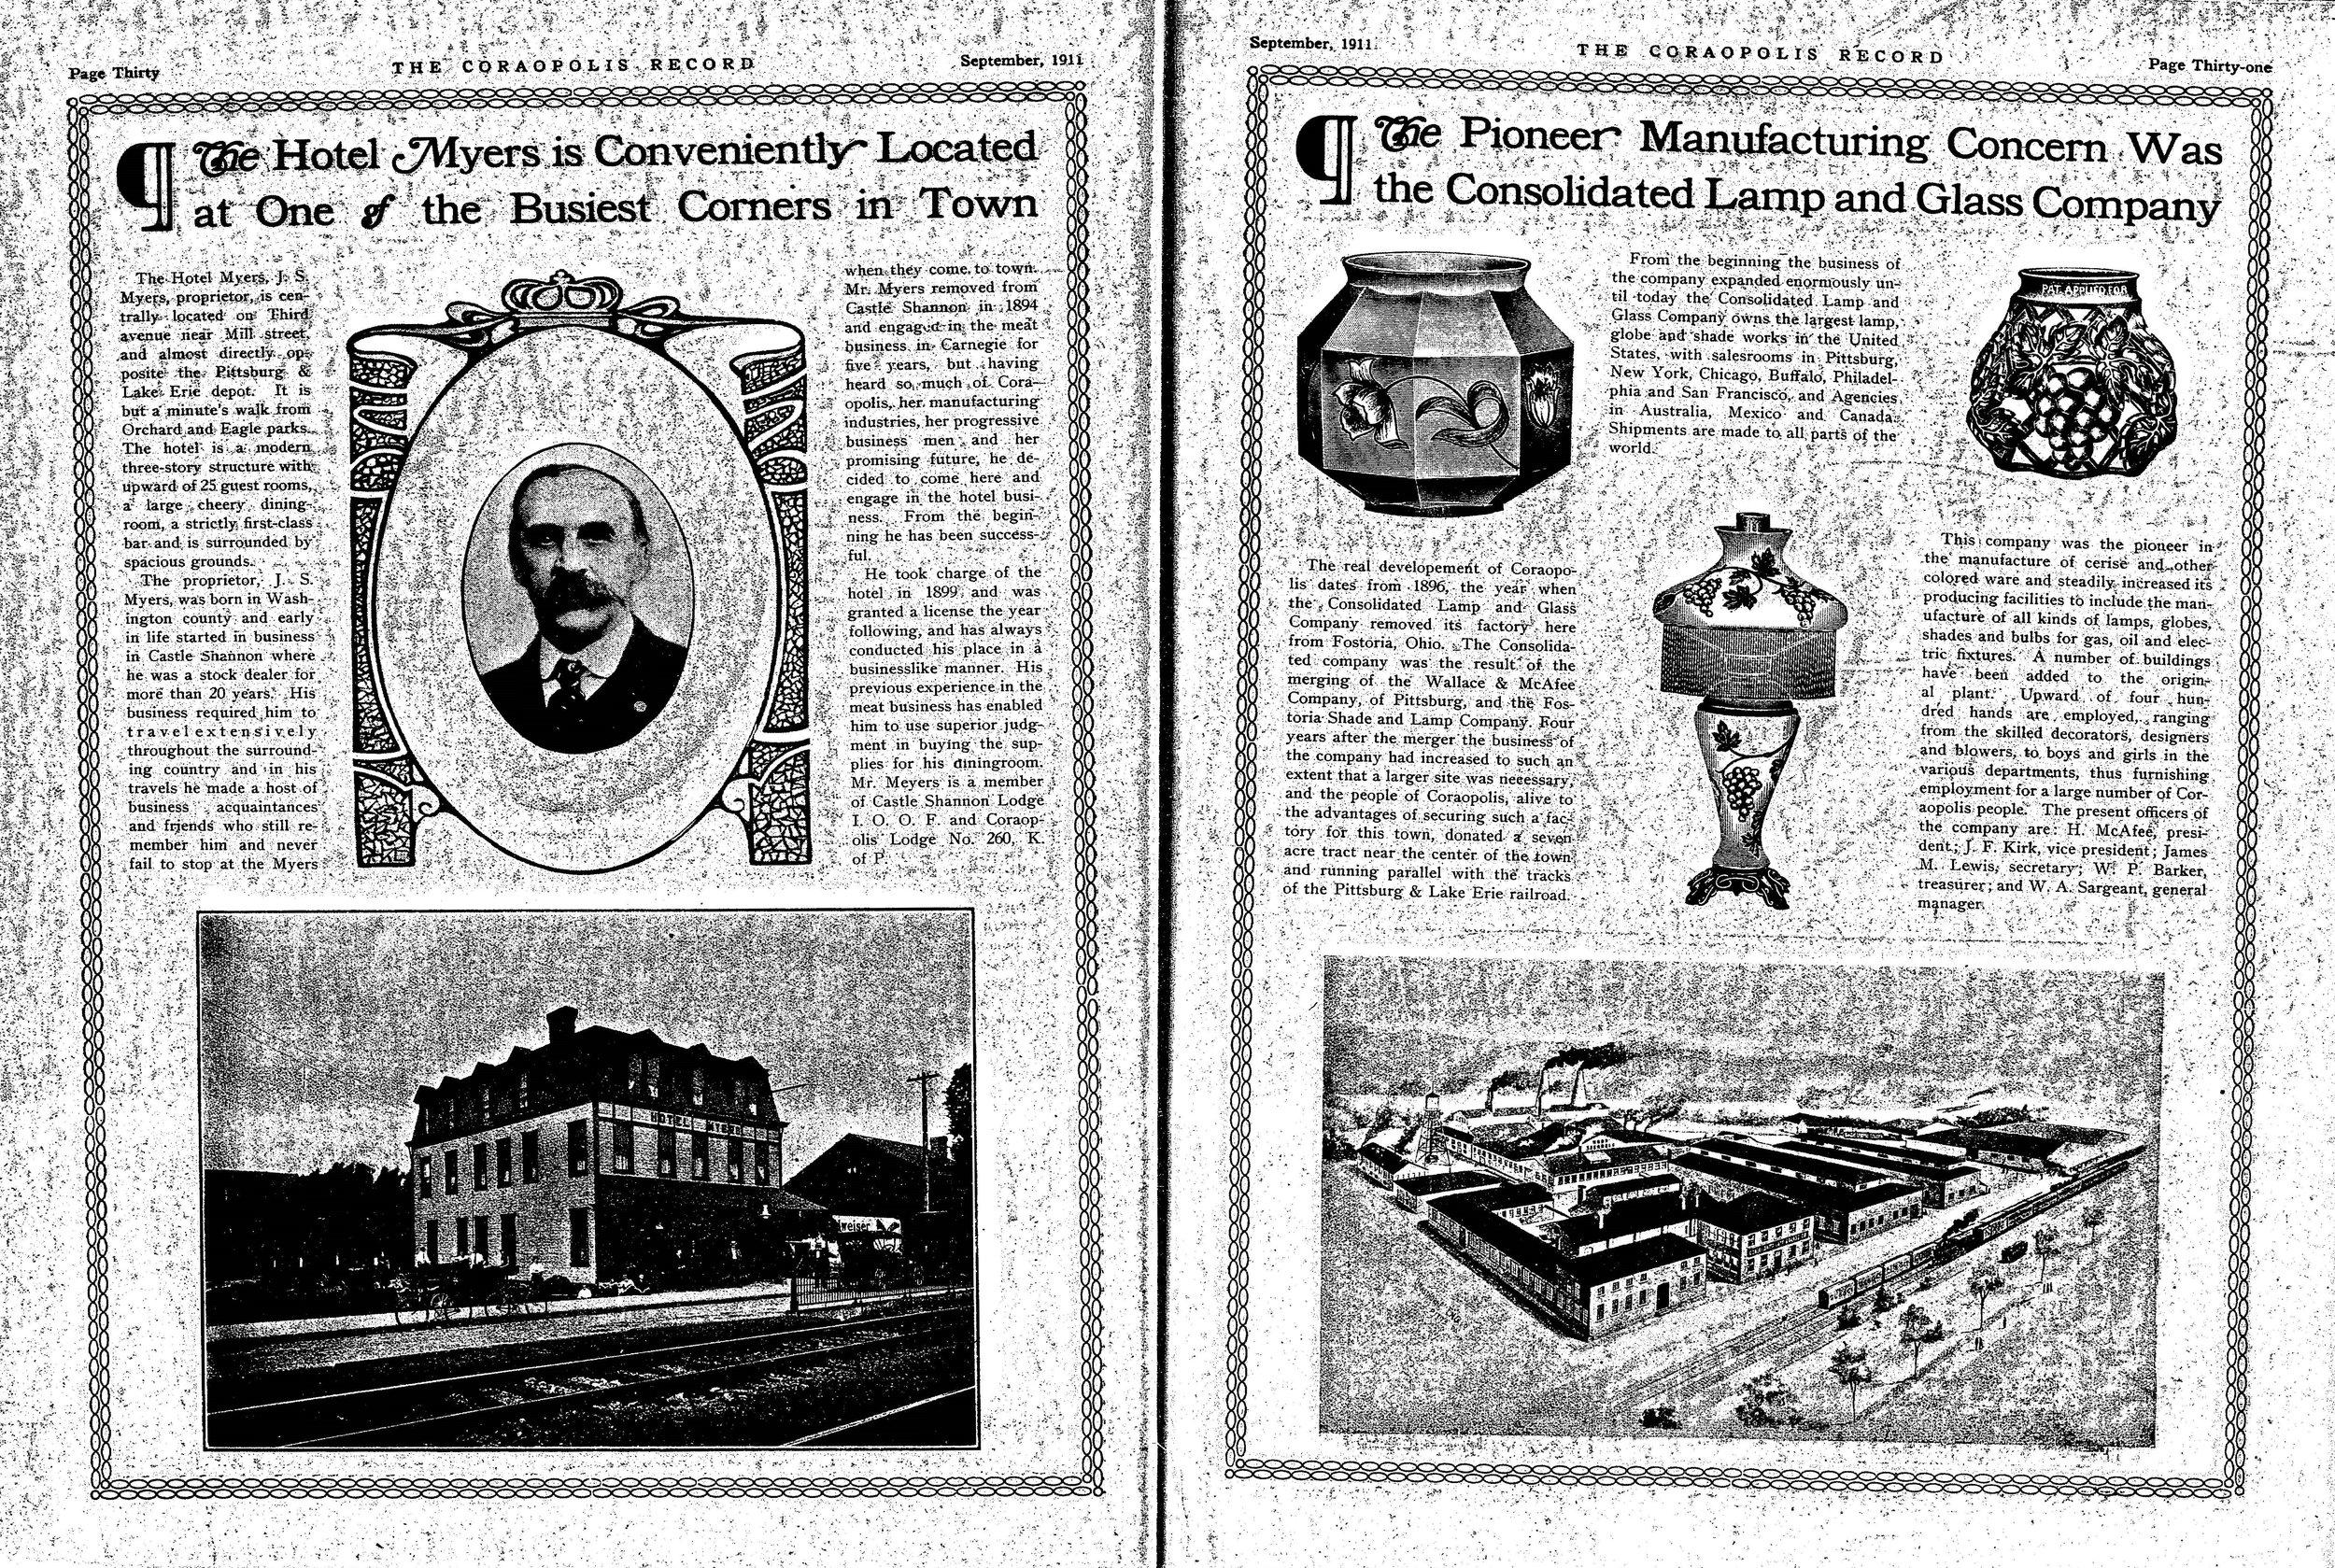 1911-09-15 The Coraopolis Record_Page_17.jpg